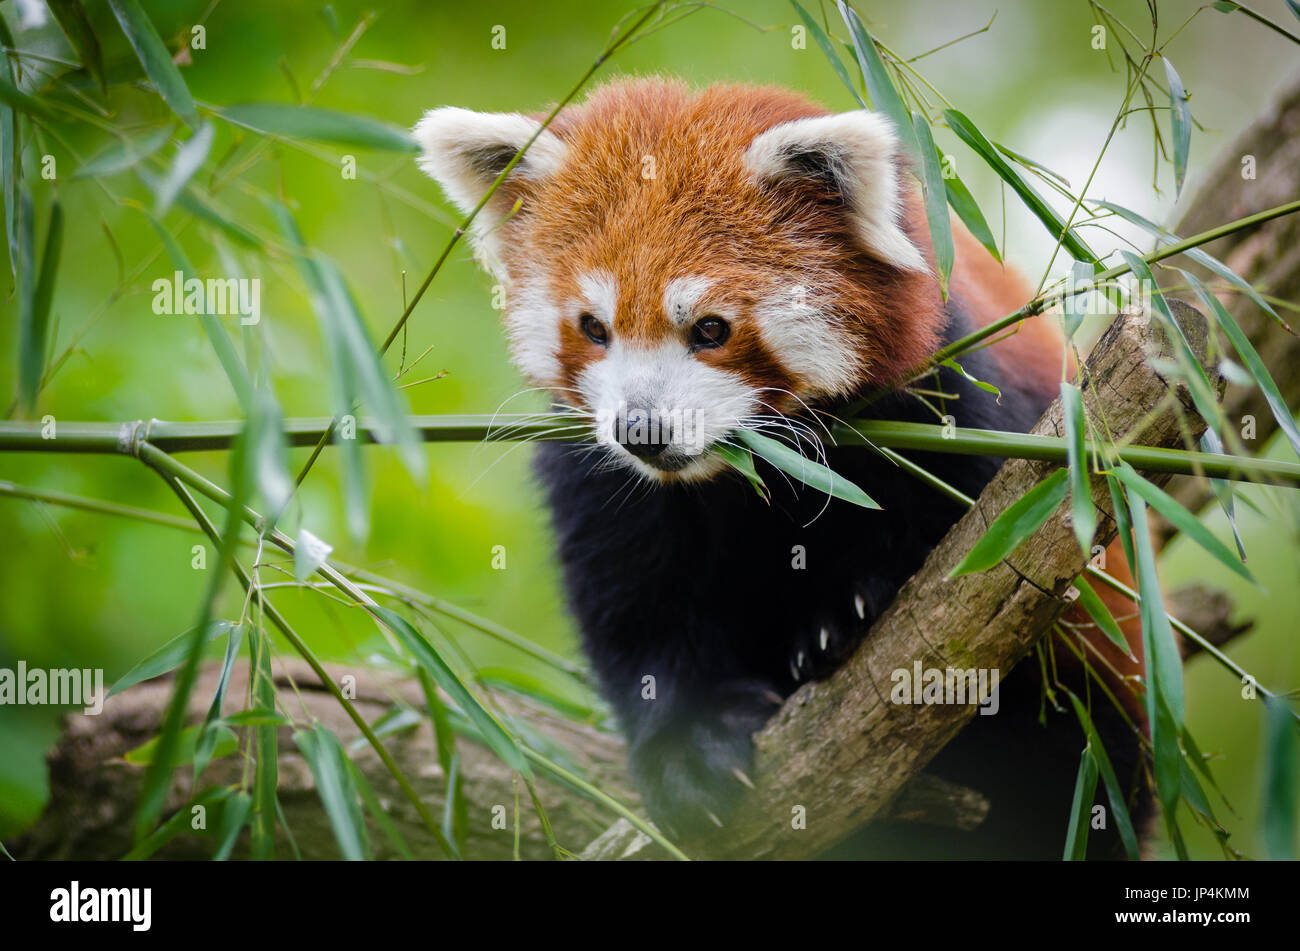 Red Panda on Tree - Stock Image